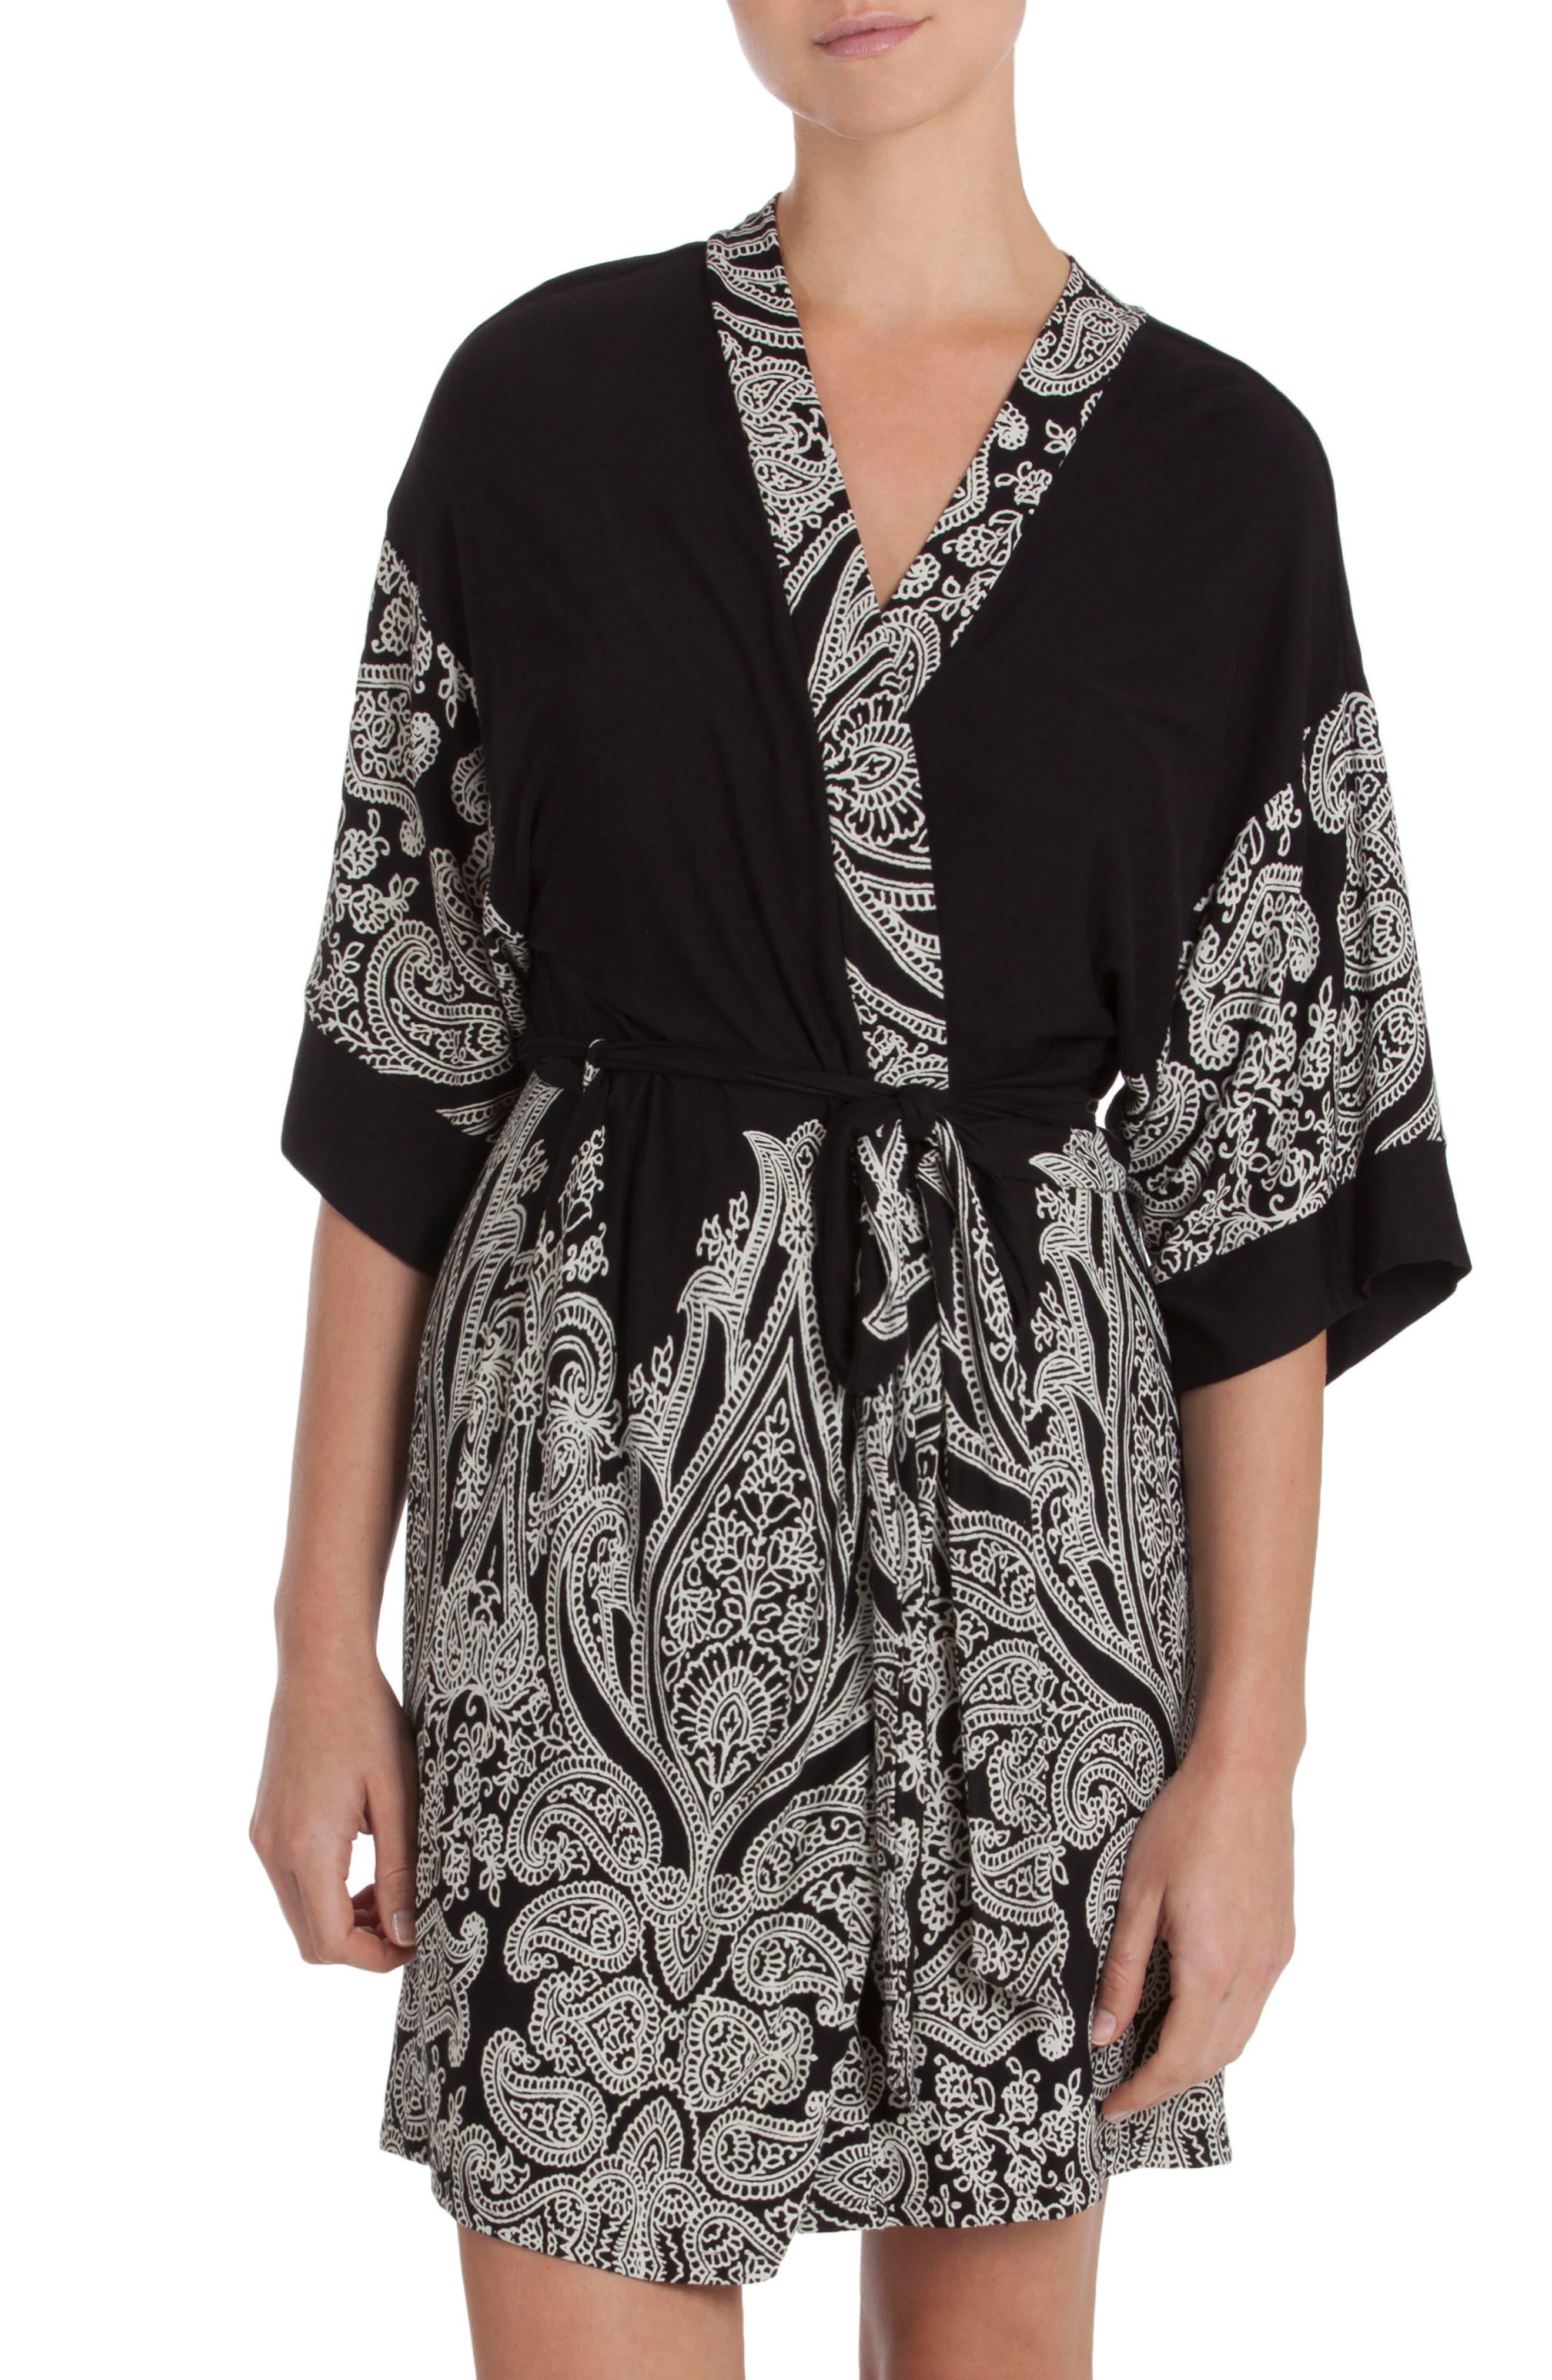 Robe,                         Main,                         color, Black/ Ivory Print